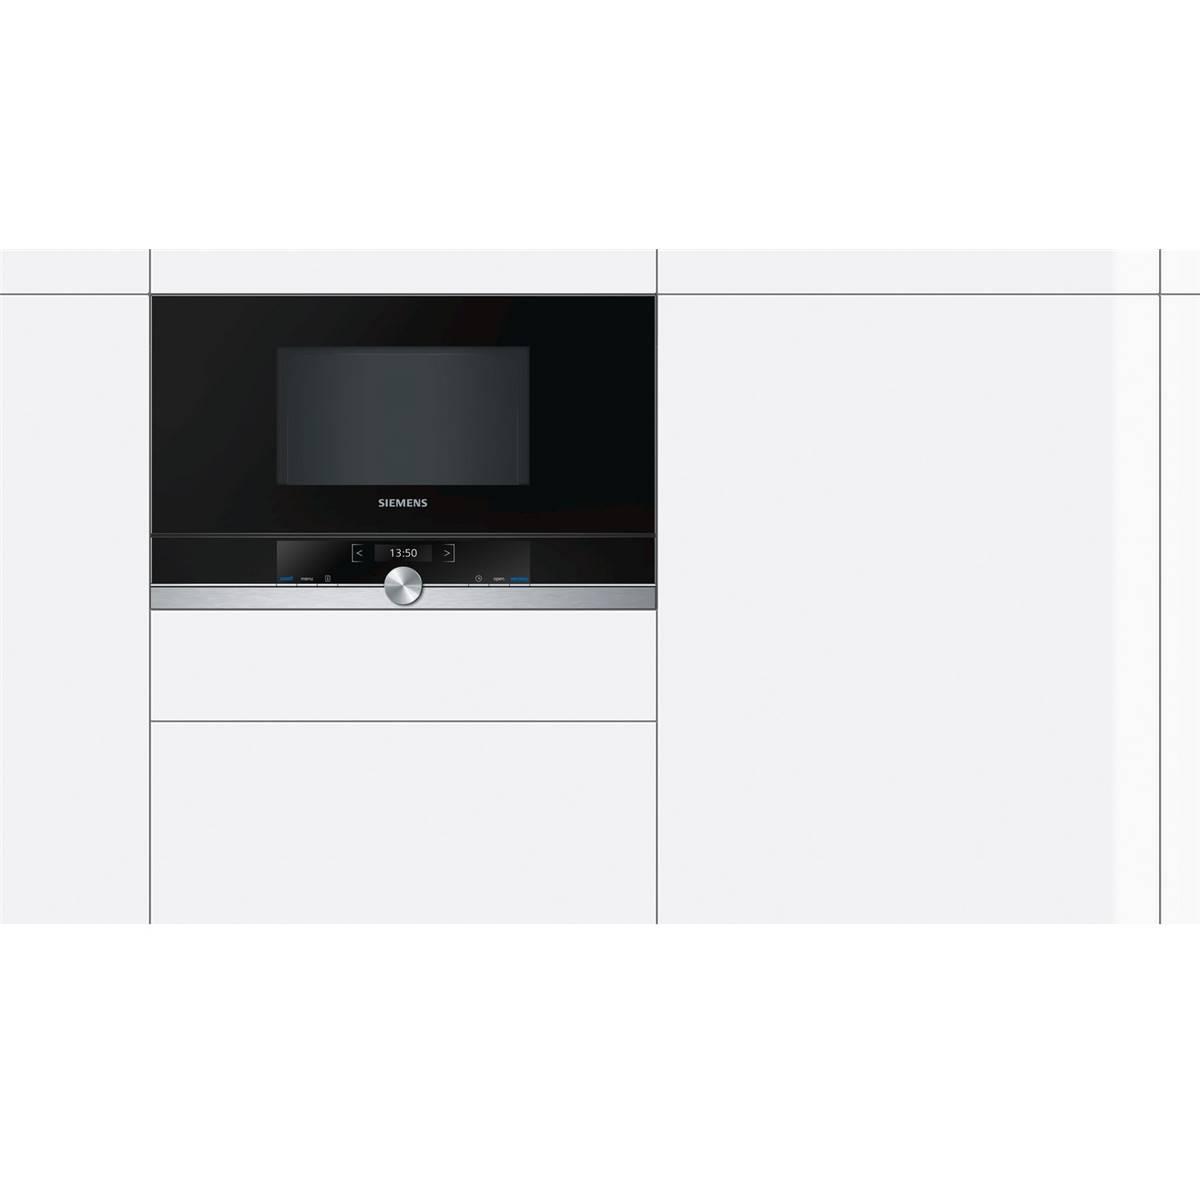 micro ondes encastrable siemens bf634lgs1. Black Bedroom Furniture Sets. Home Design Ideas